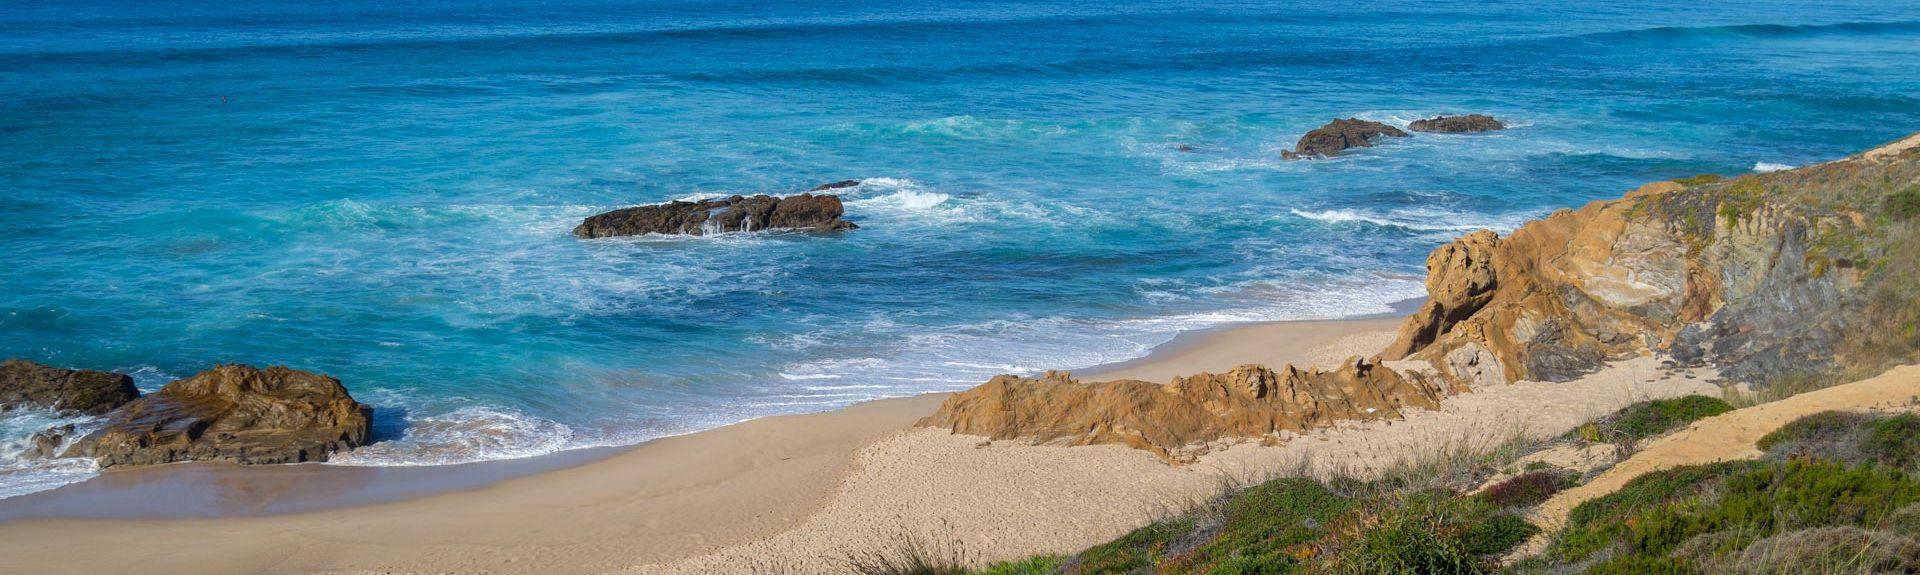 Praia das Furnas, Odemira, Distrito de Beja, Portugal